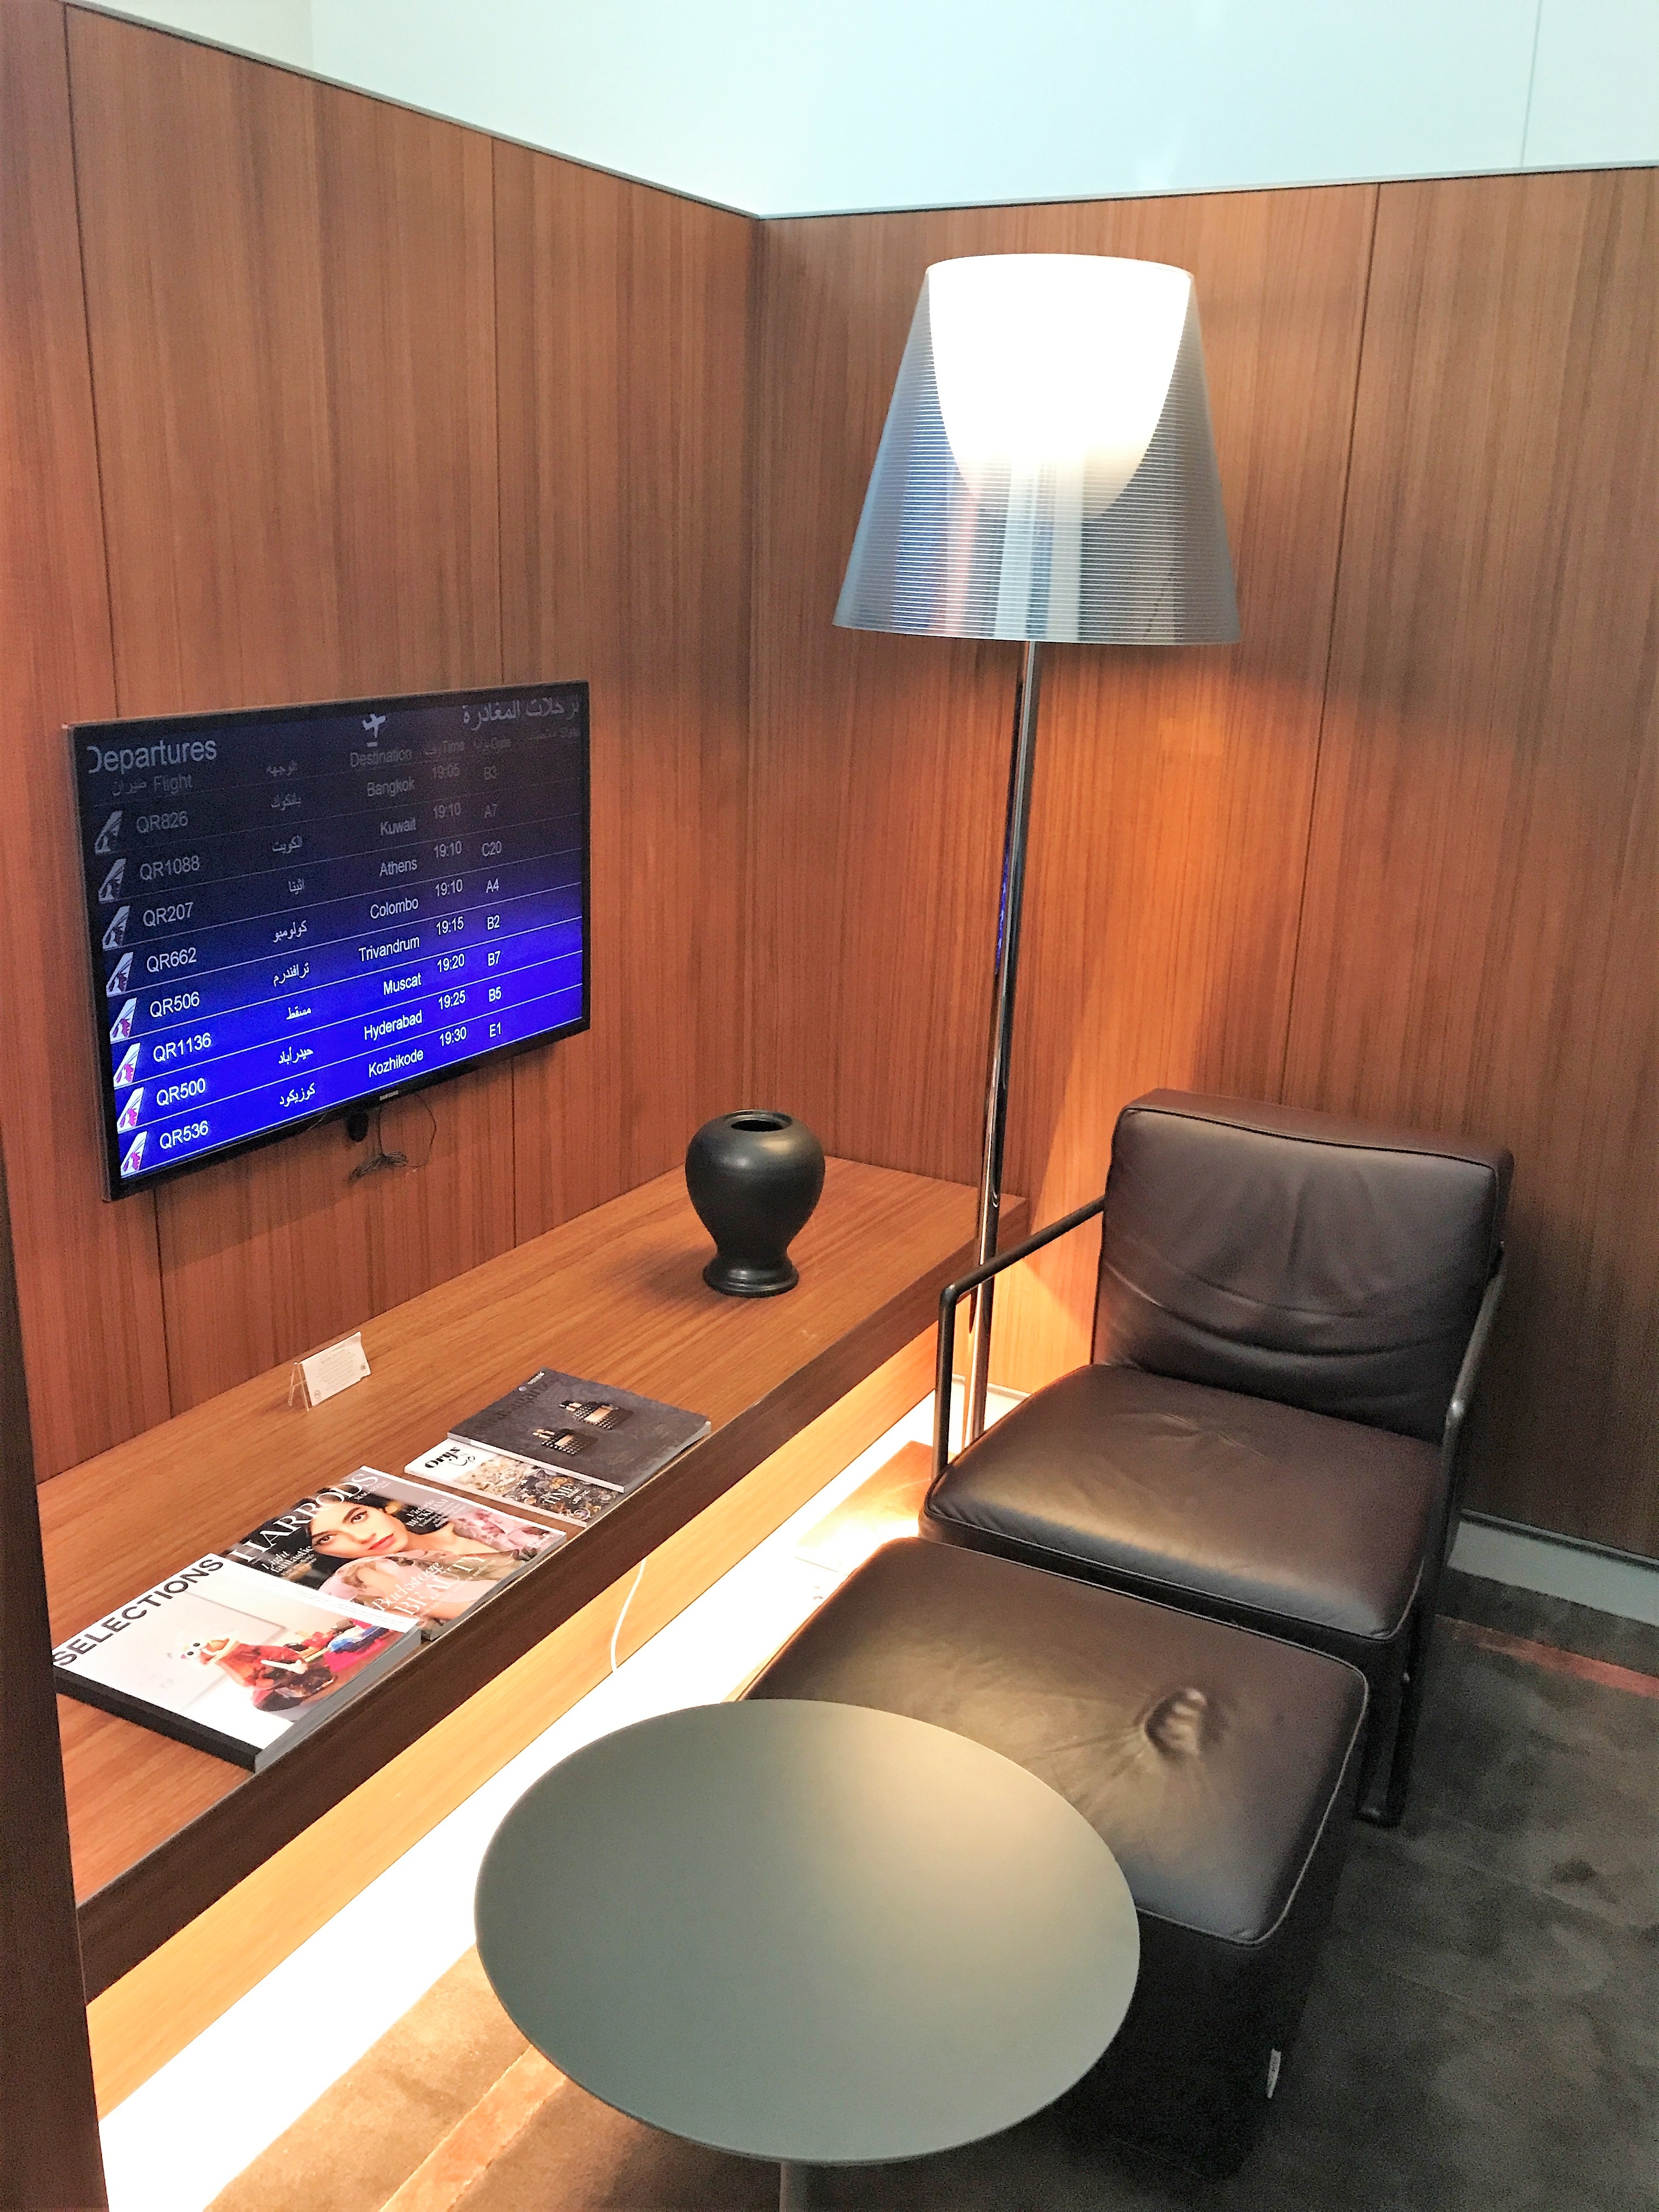 Qatar Airways Business Class Al Mourjan lounge Doha review rest area